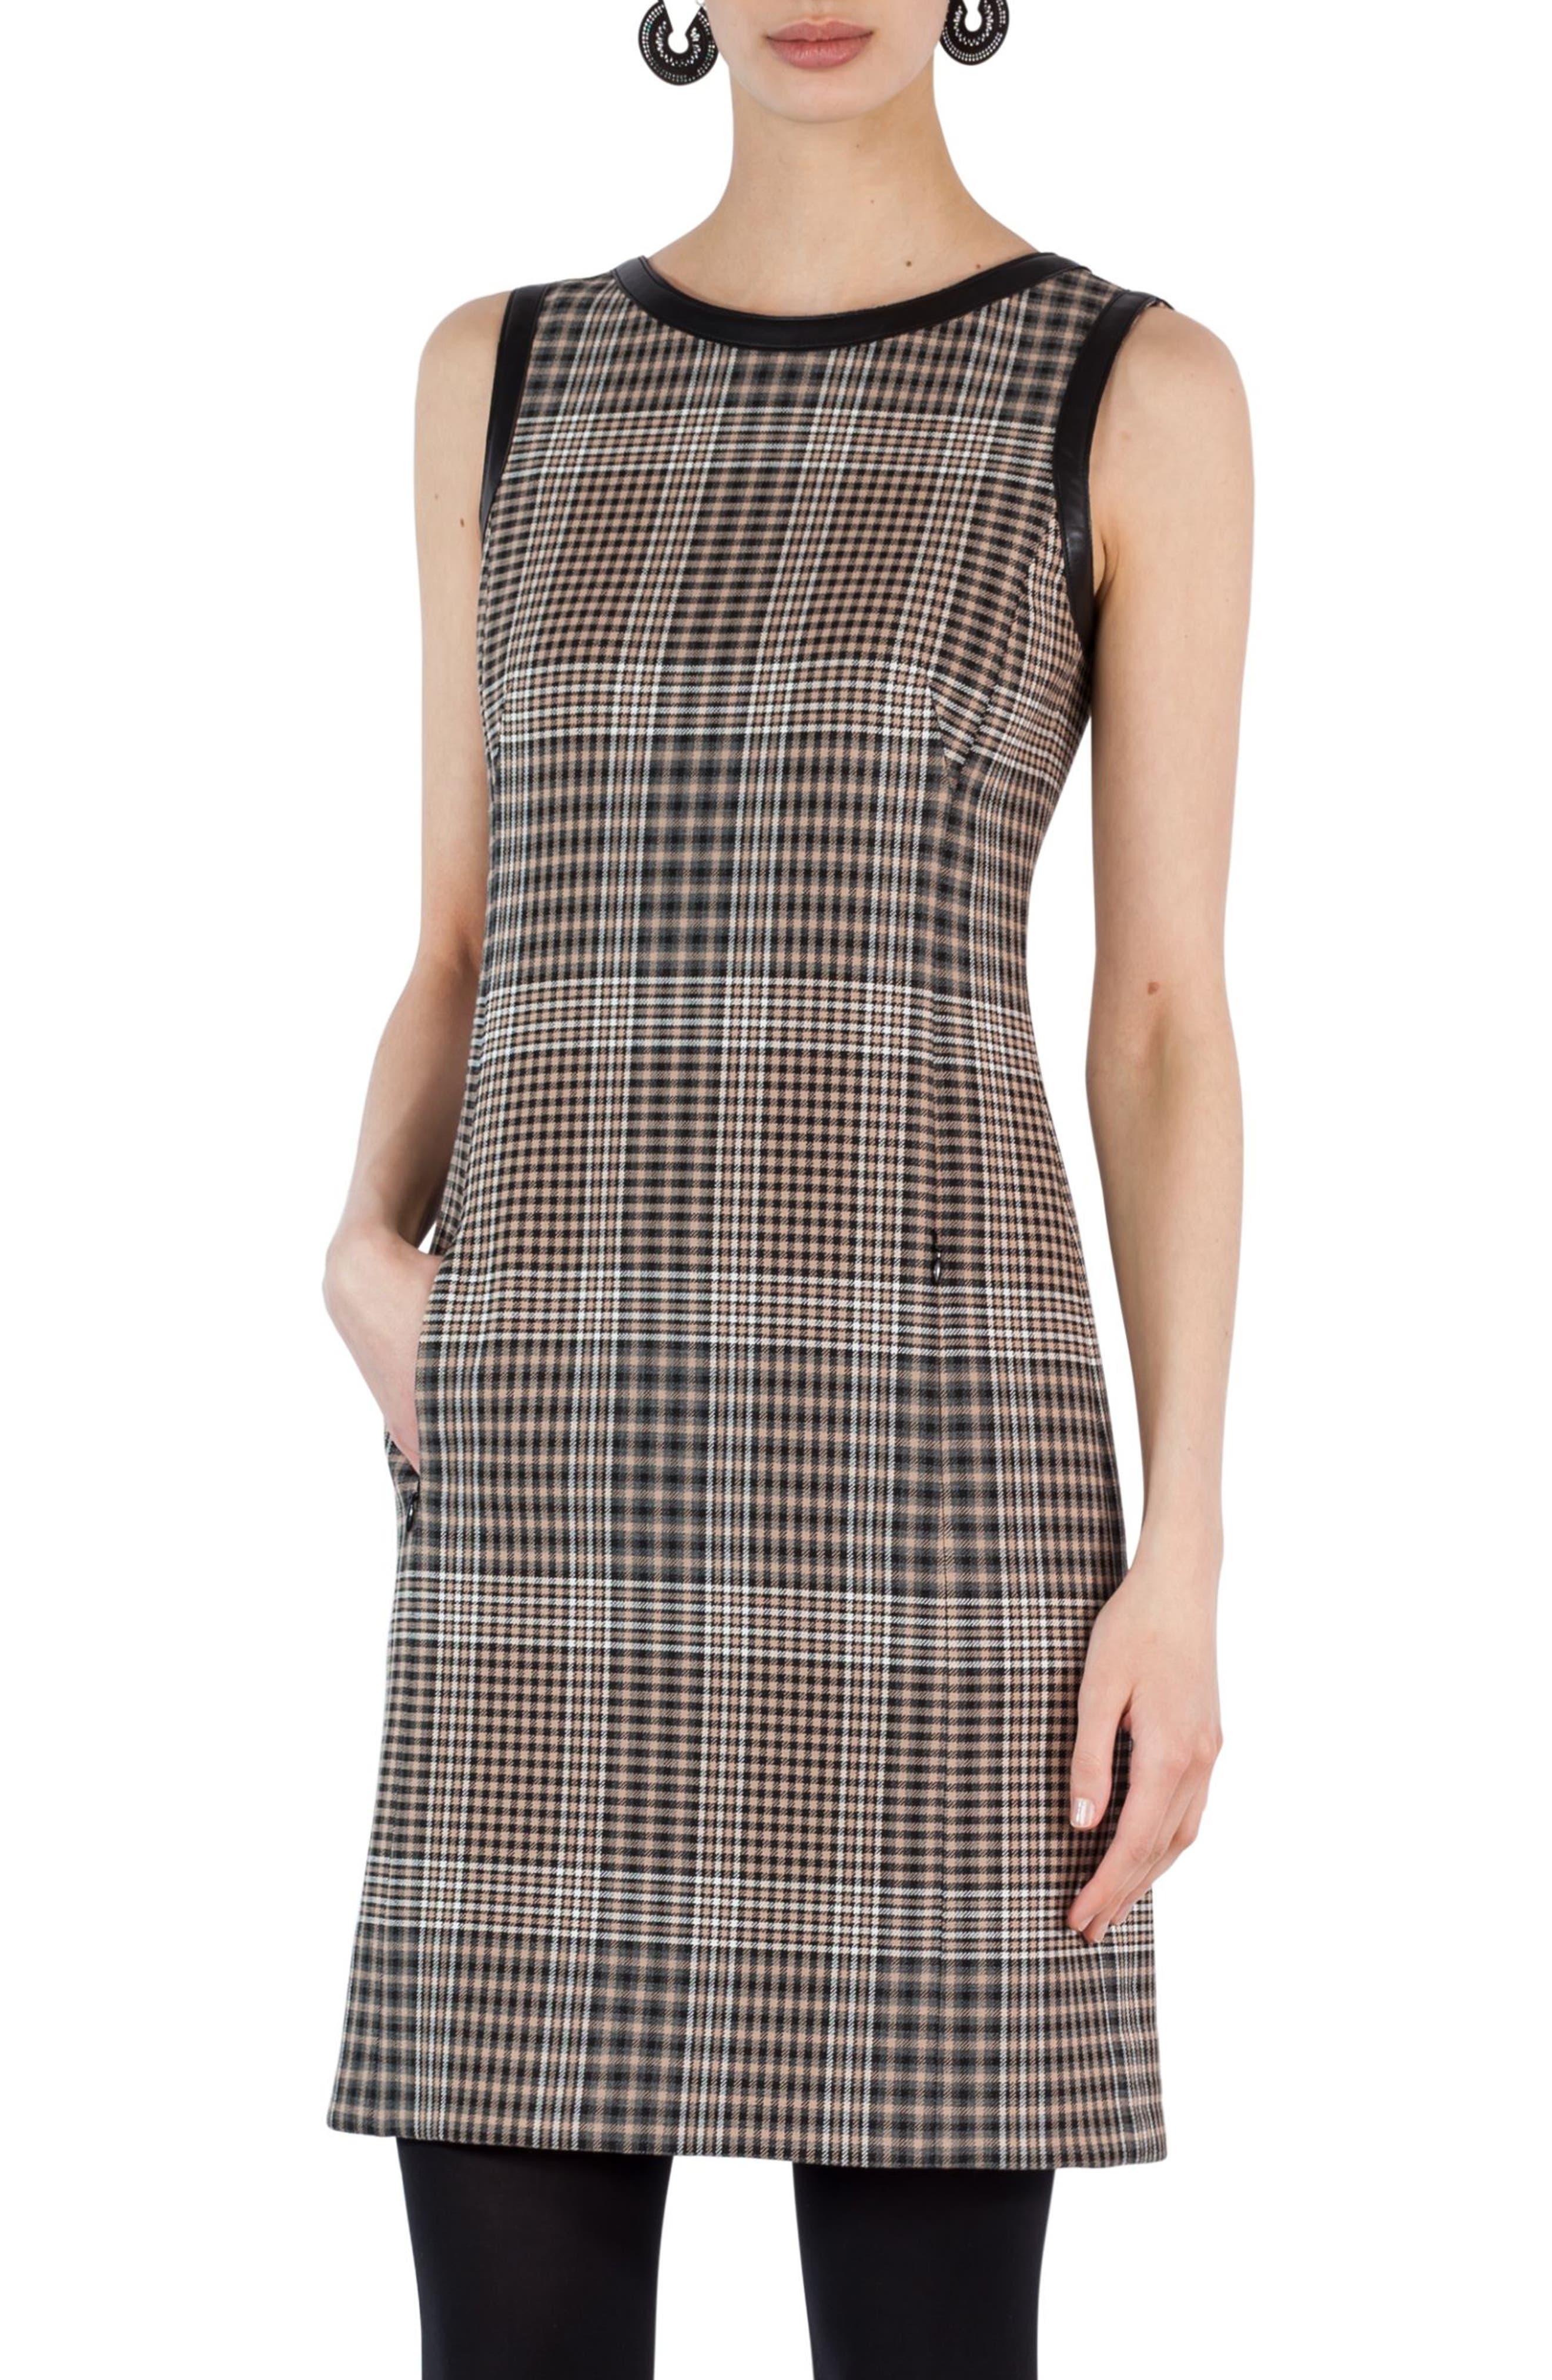 Glen Check Sheath Dress,                             Main thumbnail 1, color,                             200